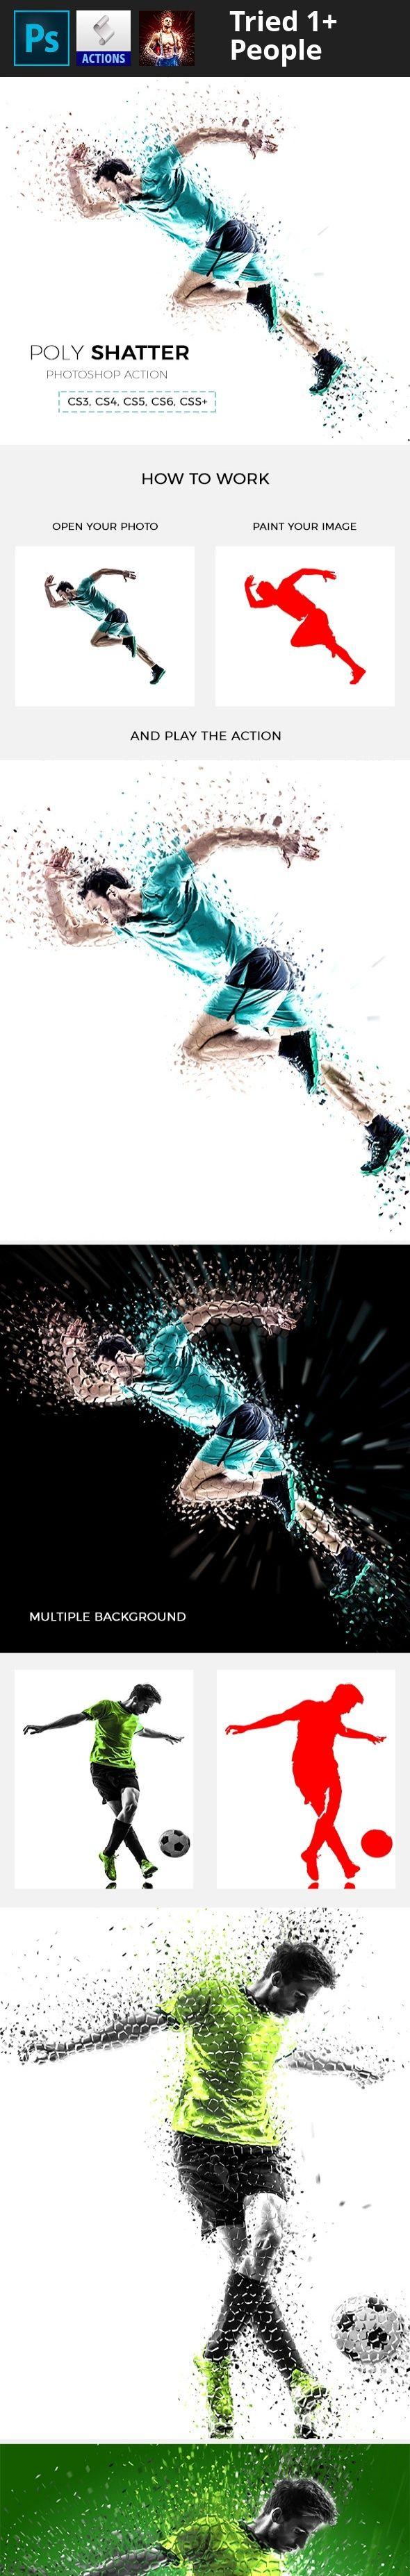 abstract, action, atn, break, broken, disperse, dispersion